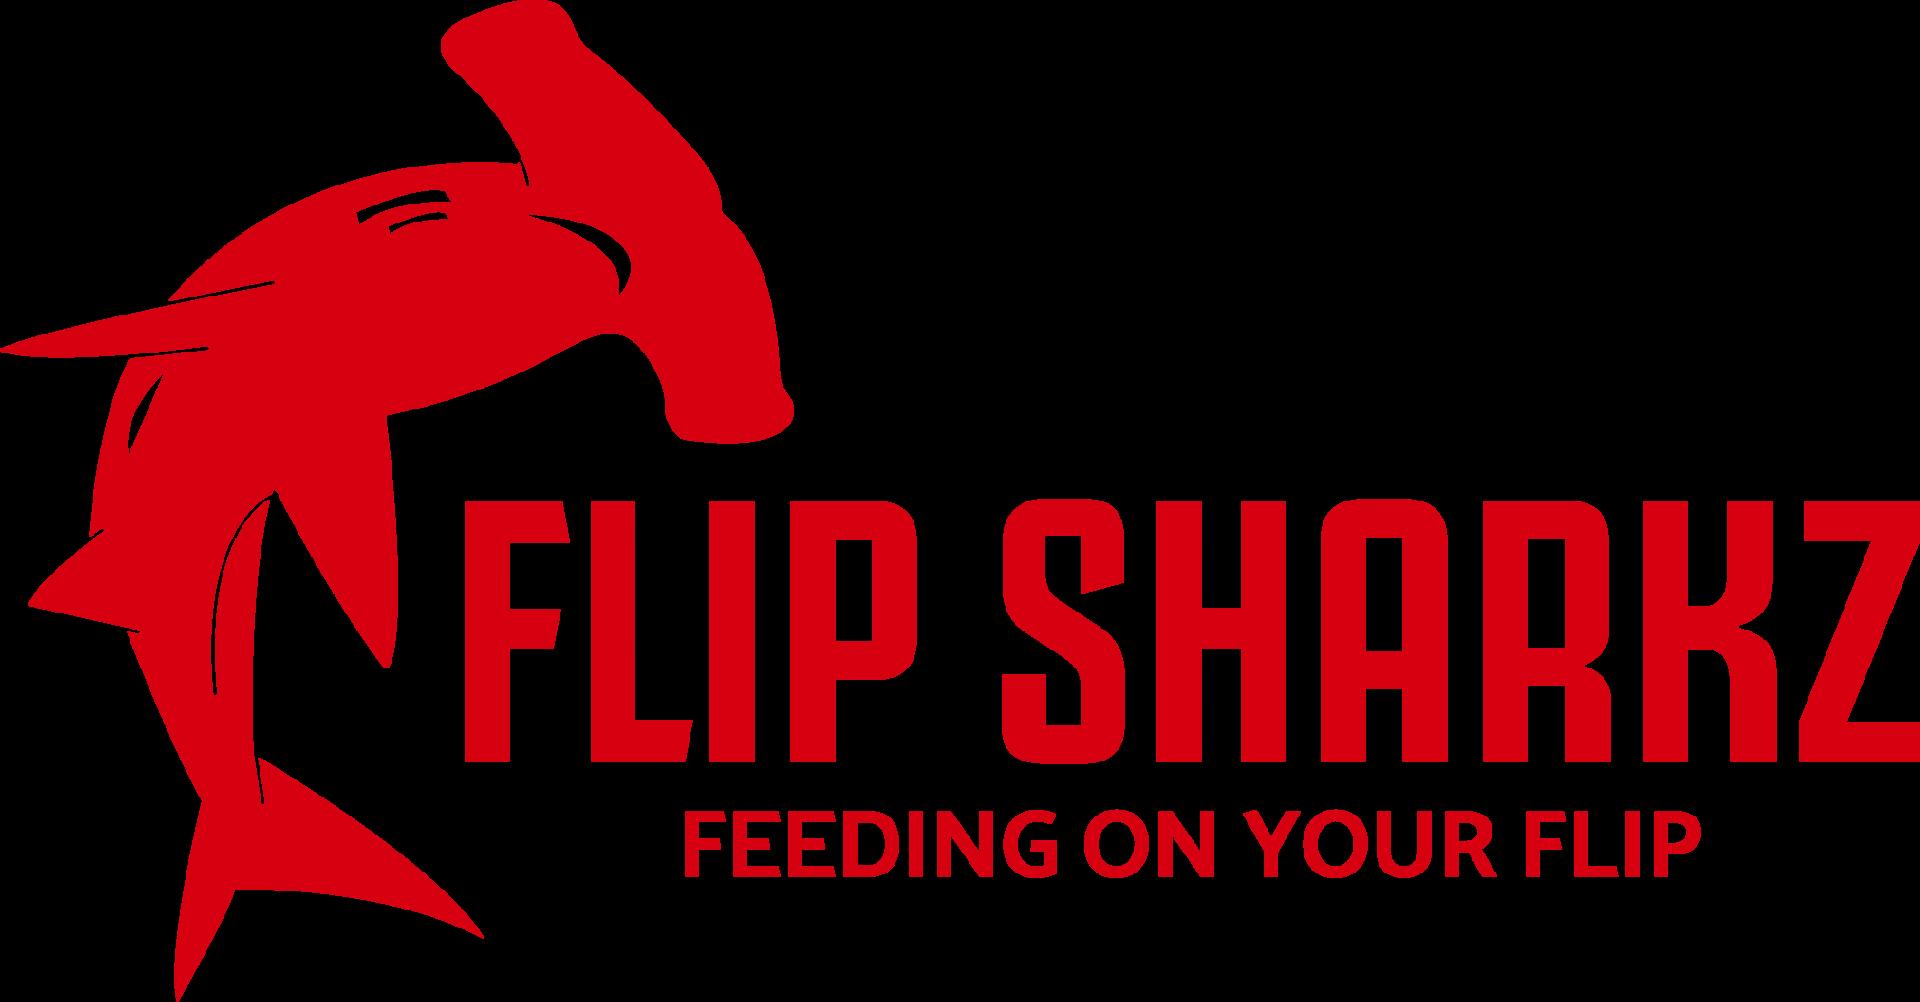 Flip Sharkz logo